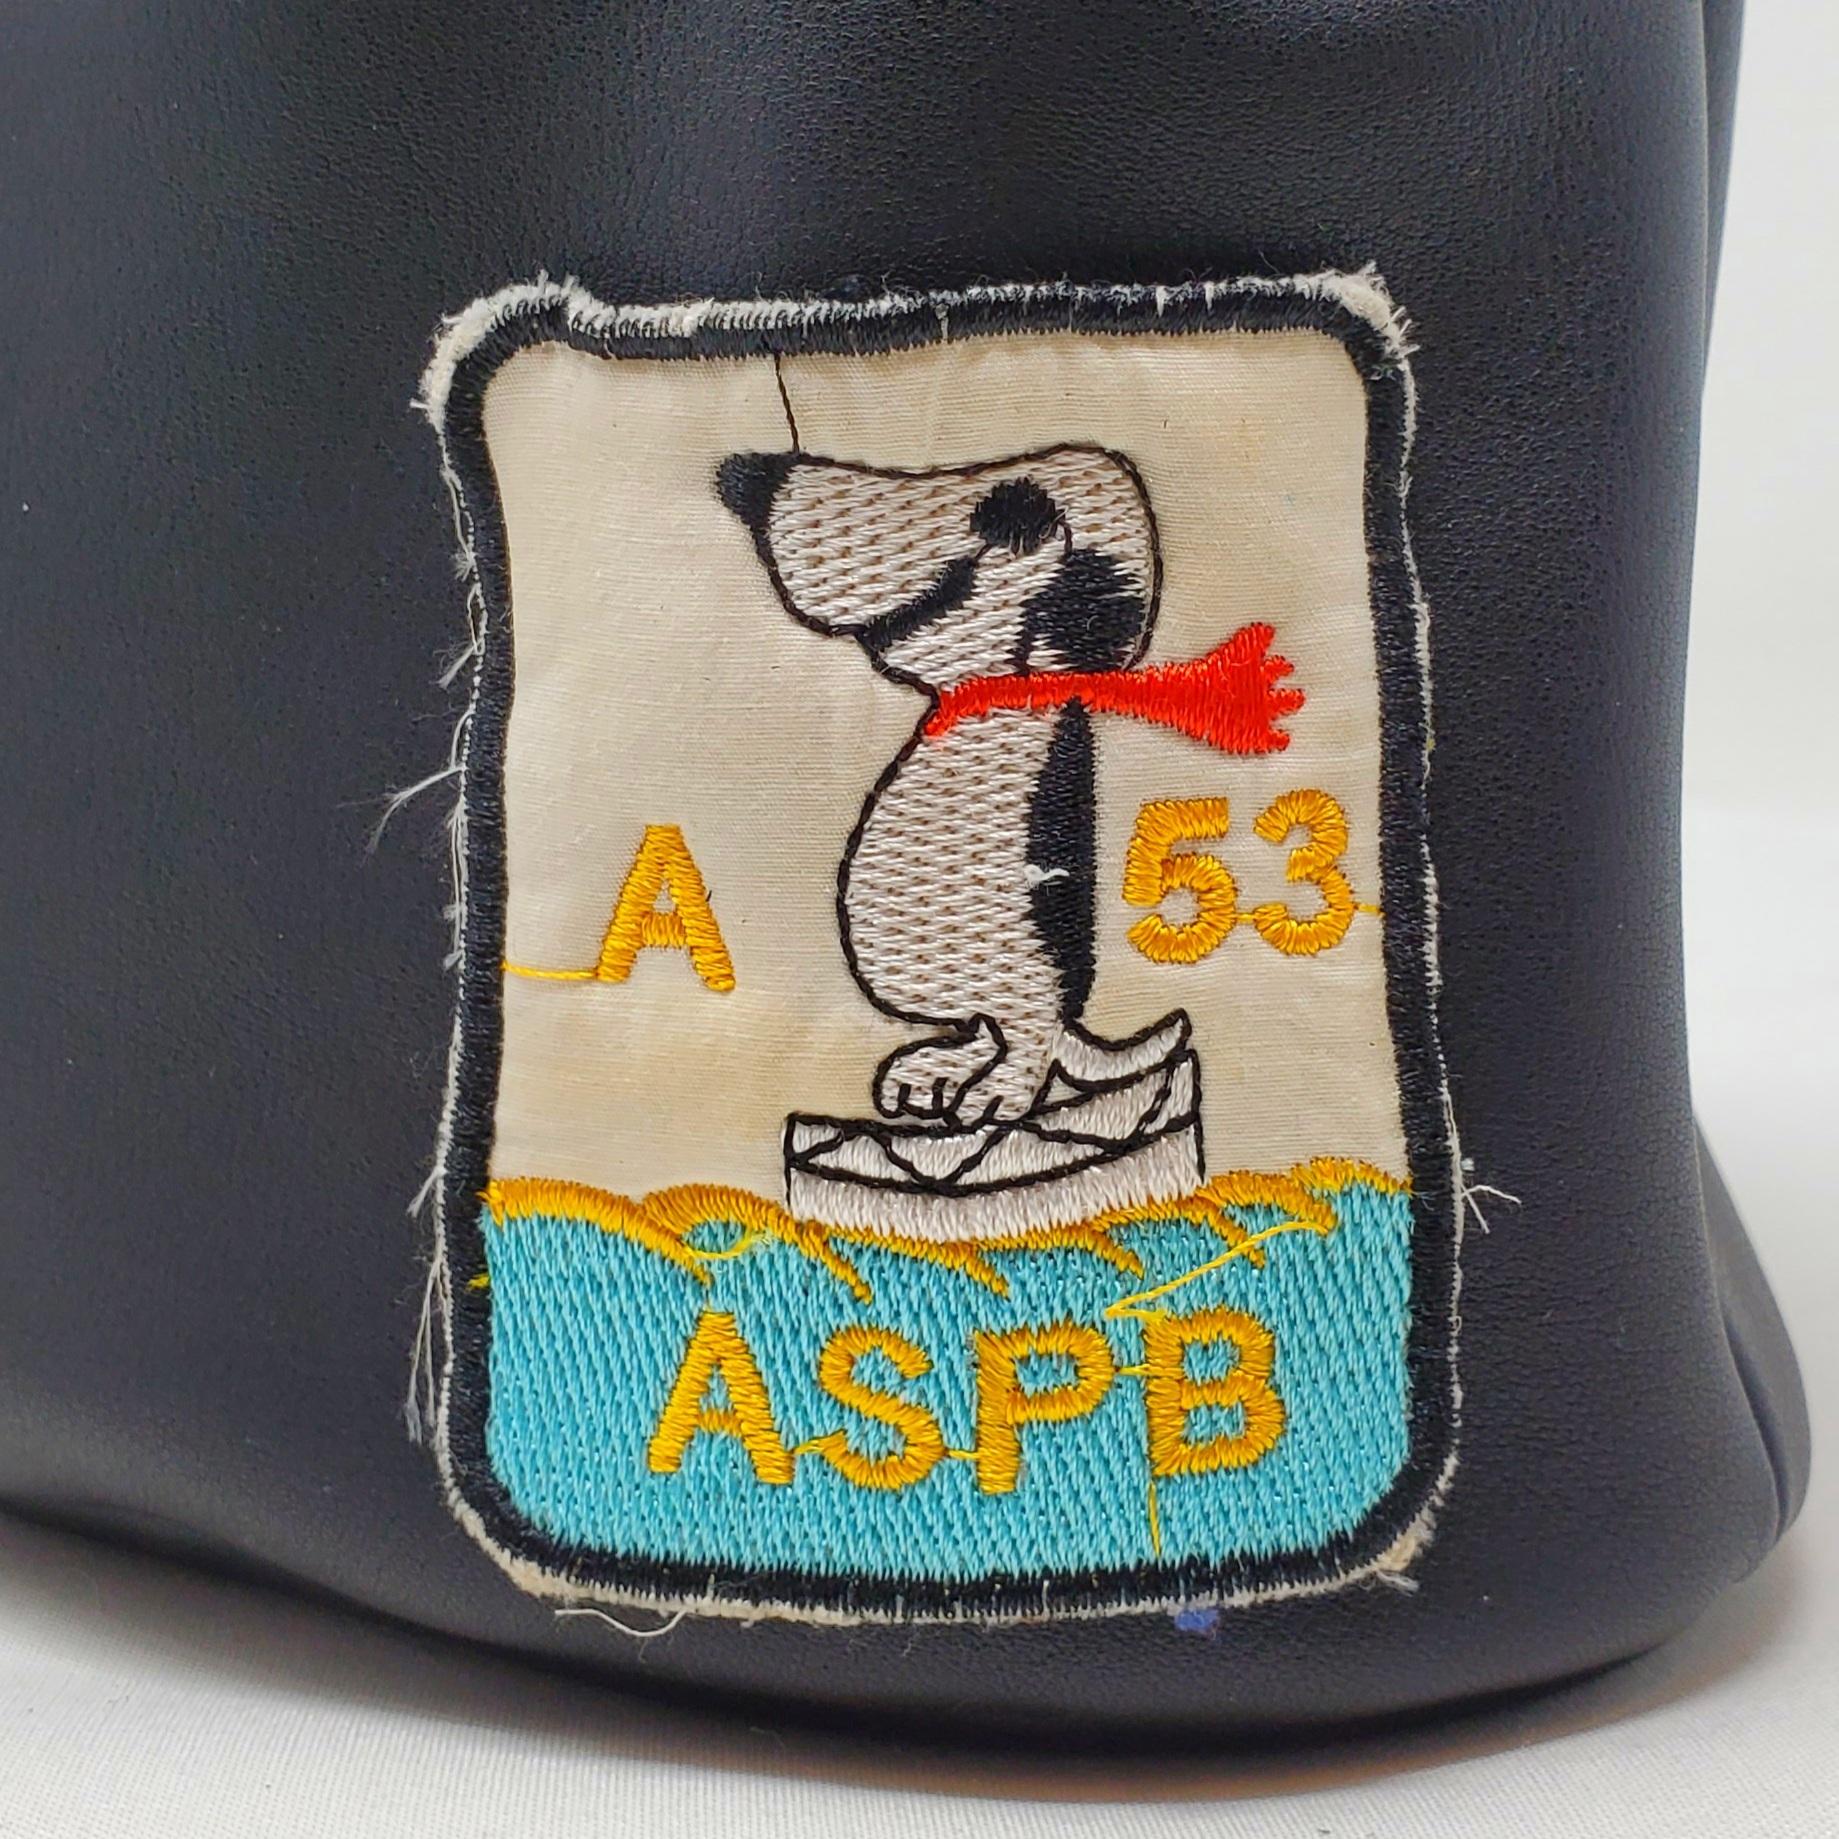 "Utility Bag03 ビンテージワッペン ""Snoopy?""01 - 画像5"